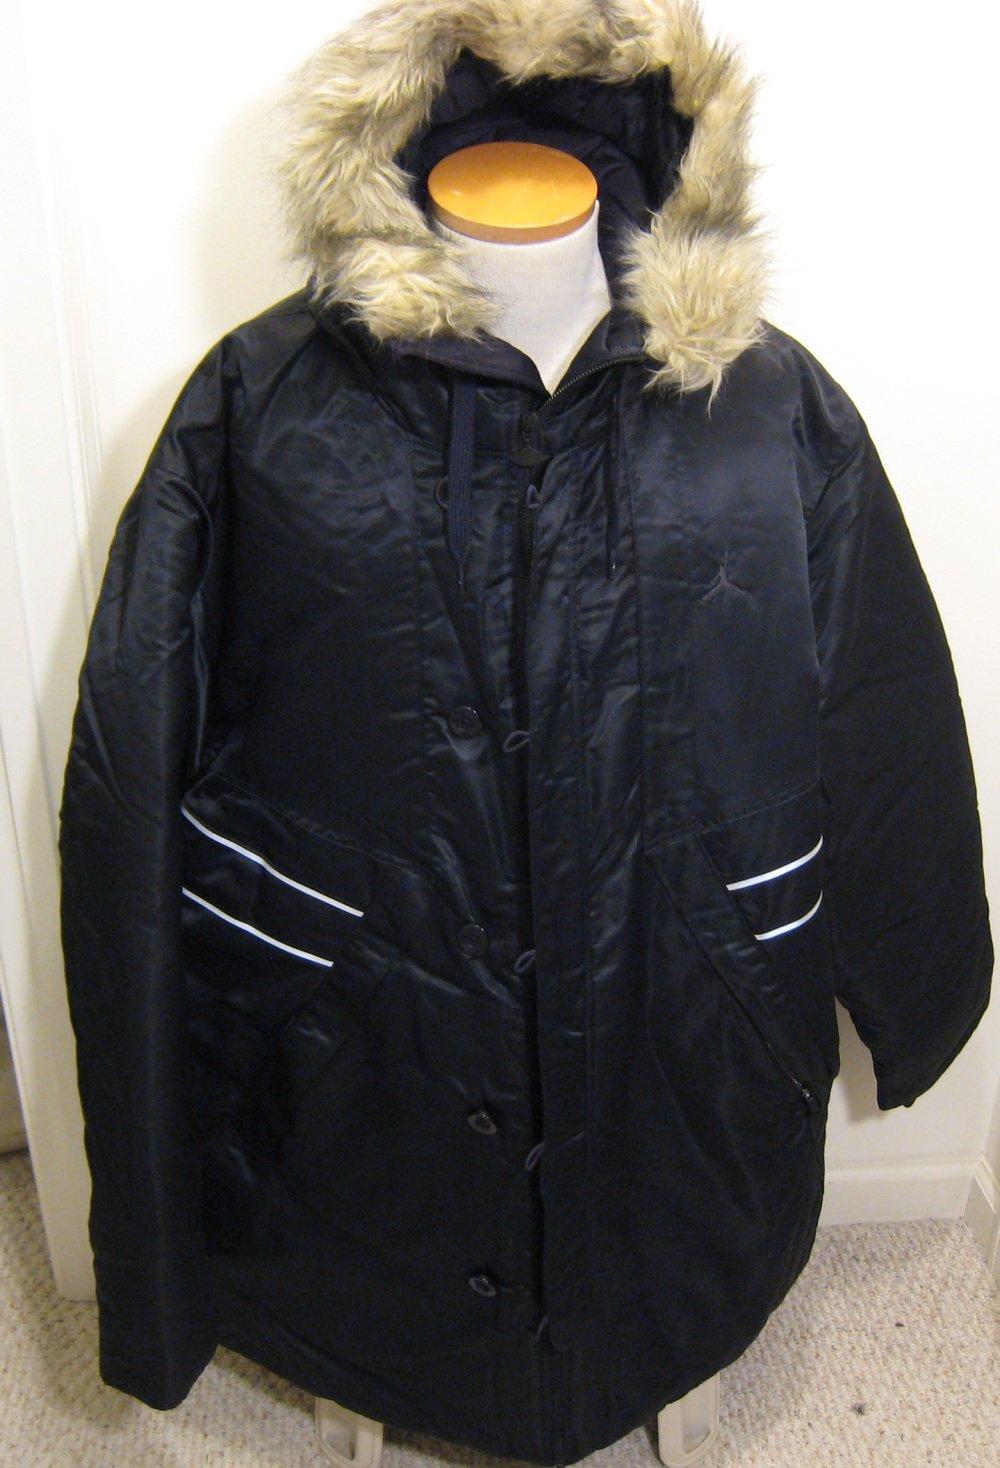 0da959c3575e NEW NIKE JORDAN Mens Hooded Hoodie Jacket Coat 3XL XXXL NWT Black